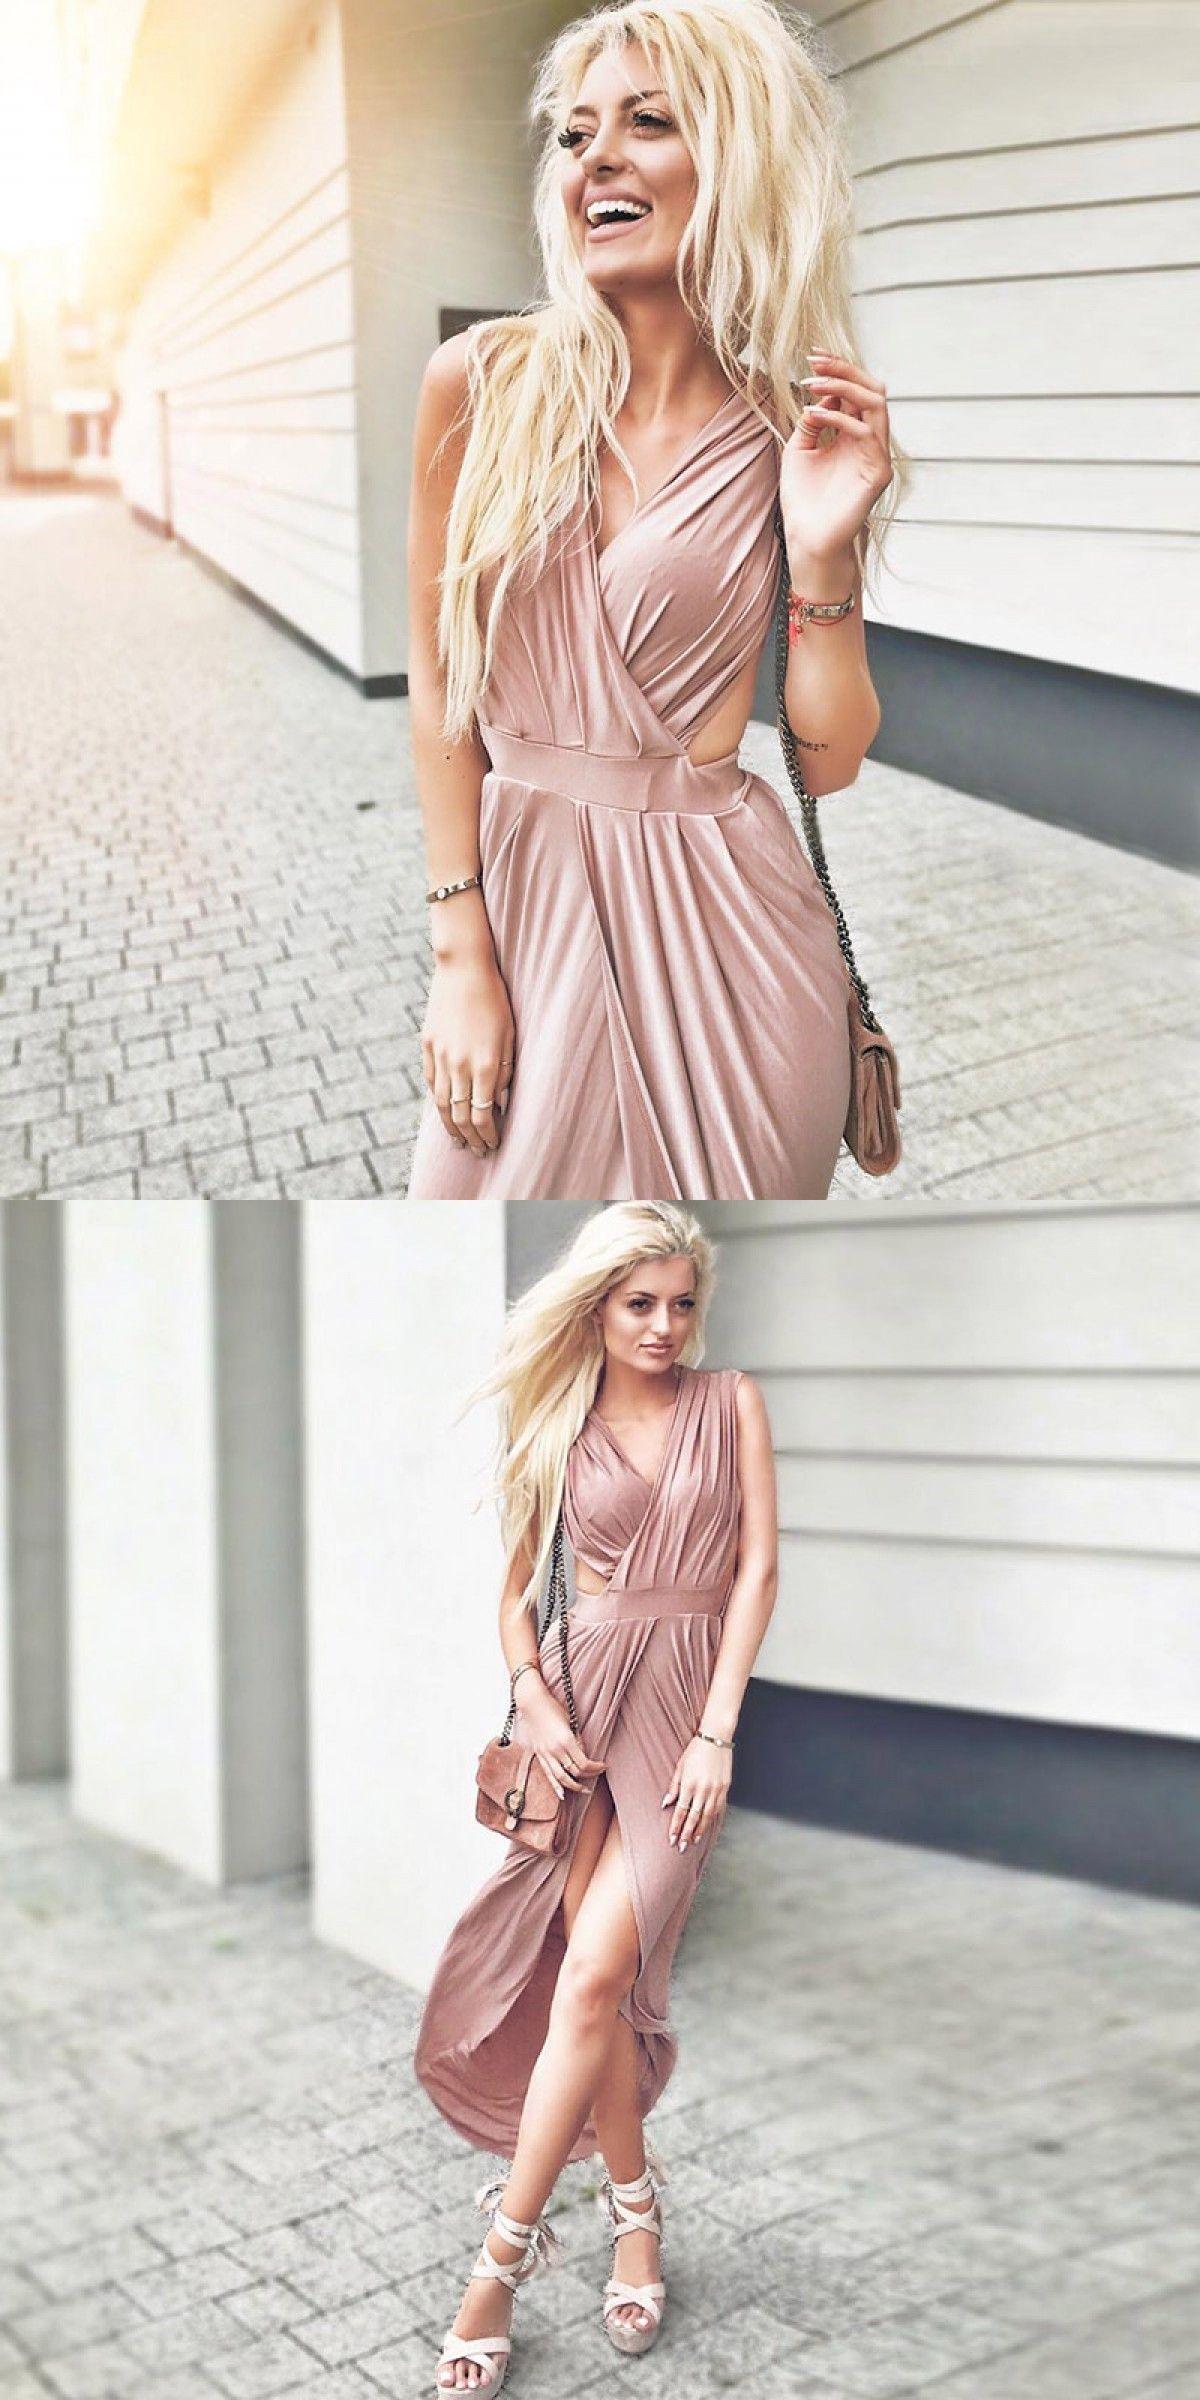 Aline vneck open back asymmetry pleated blush prom dress